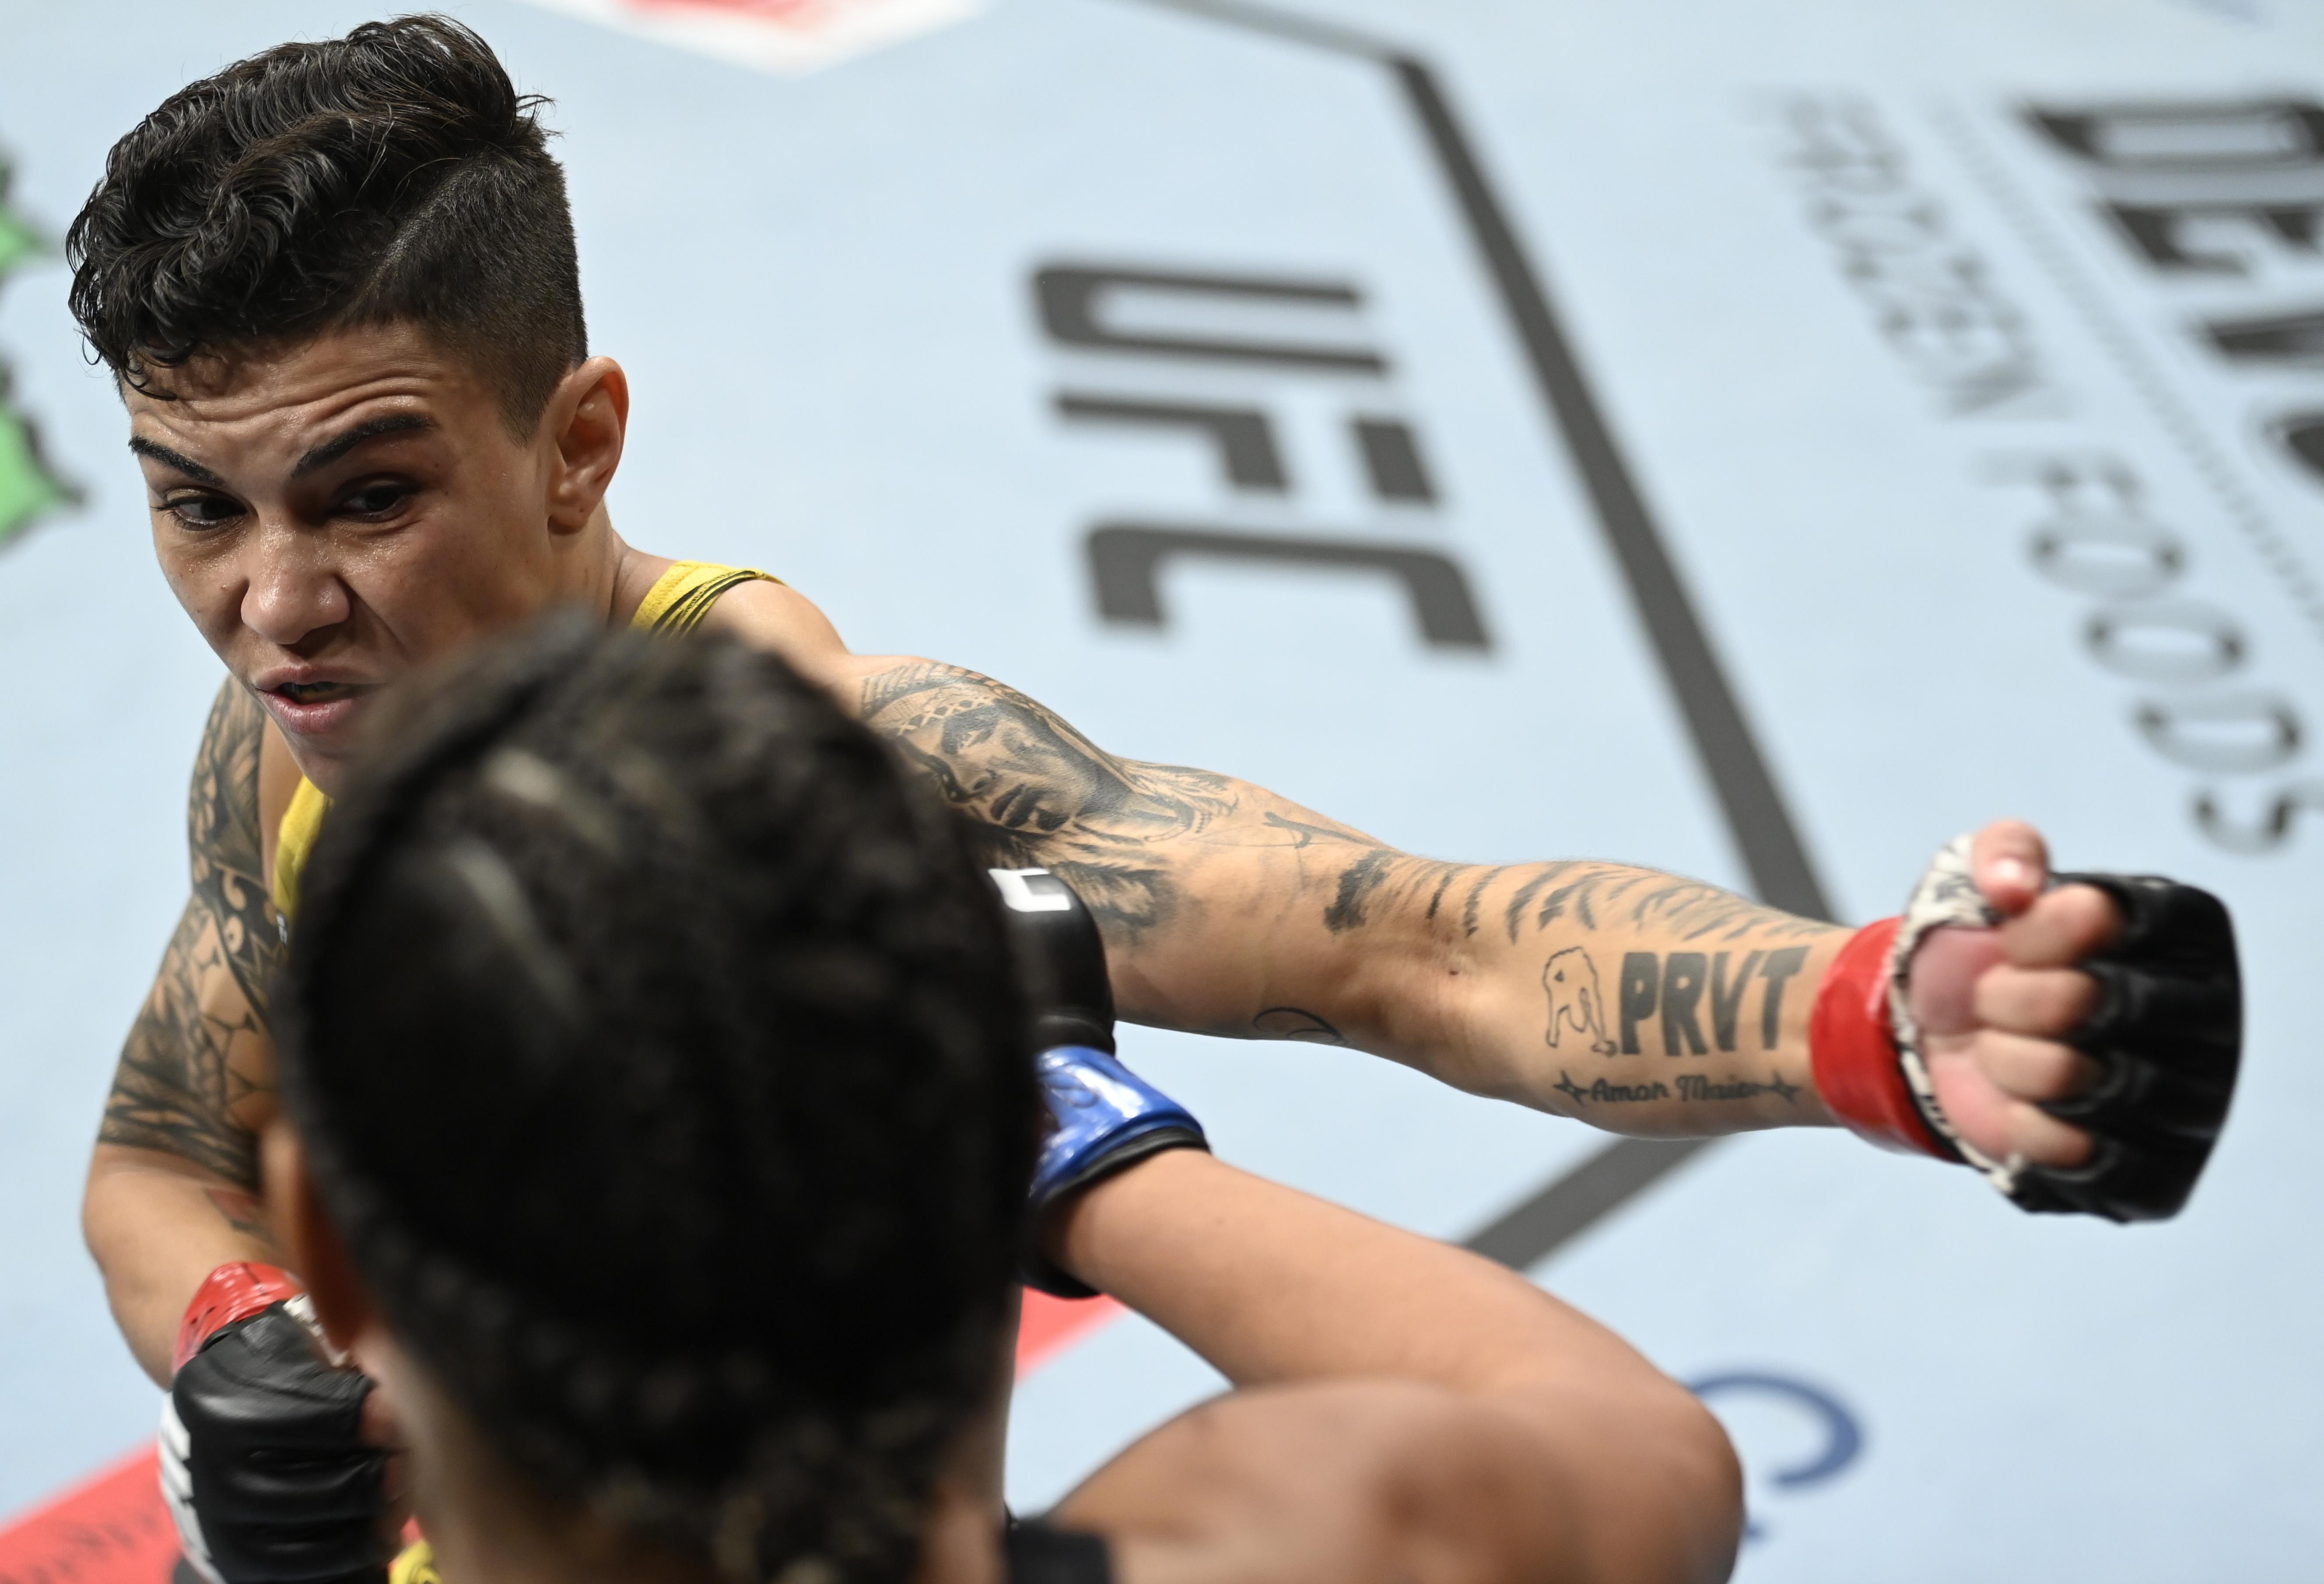 Jessica Andrade TKO'd Cynthia Calvillo at UFC 266,